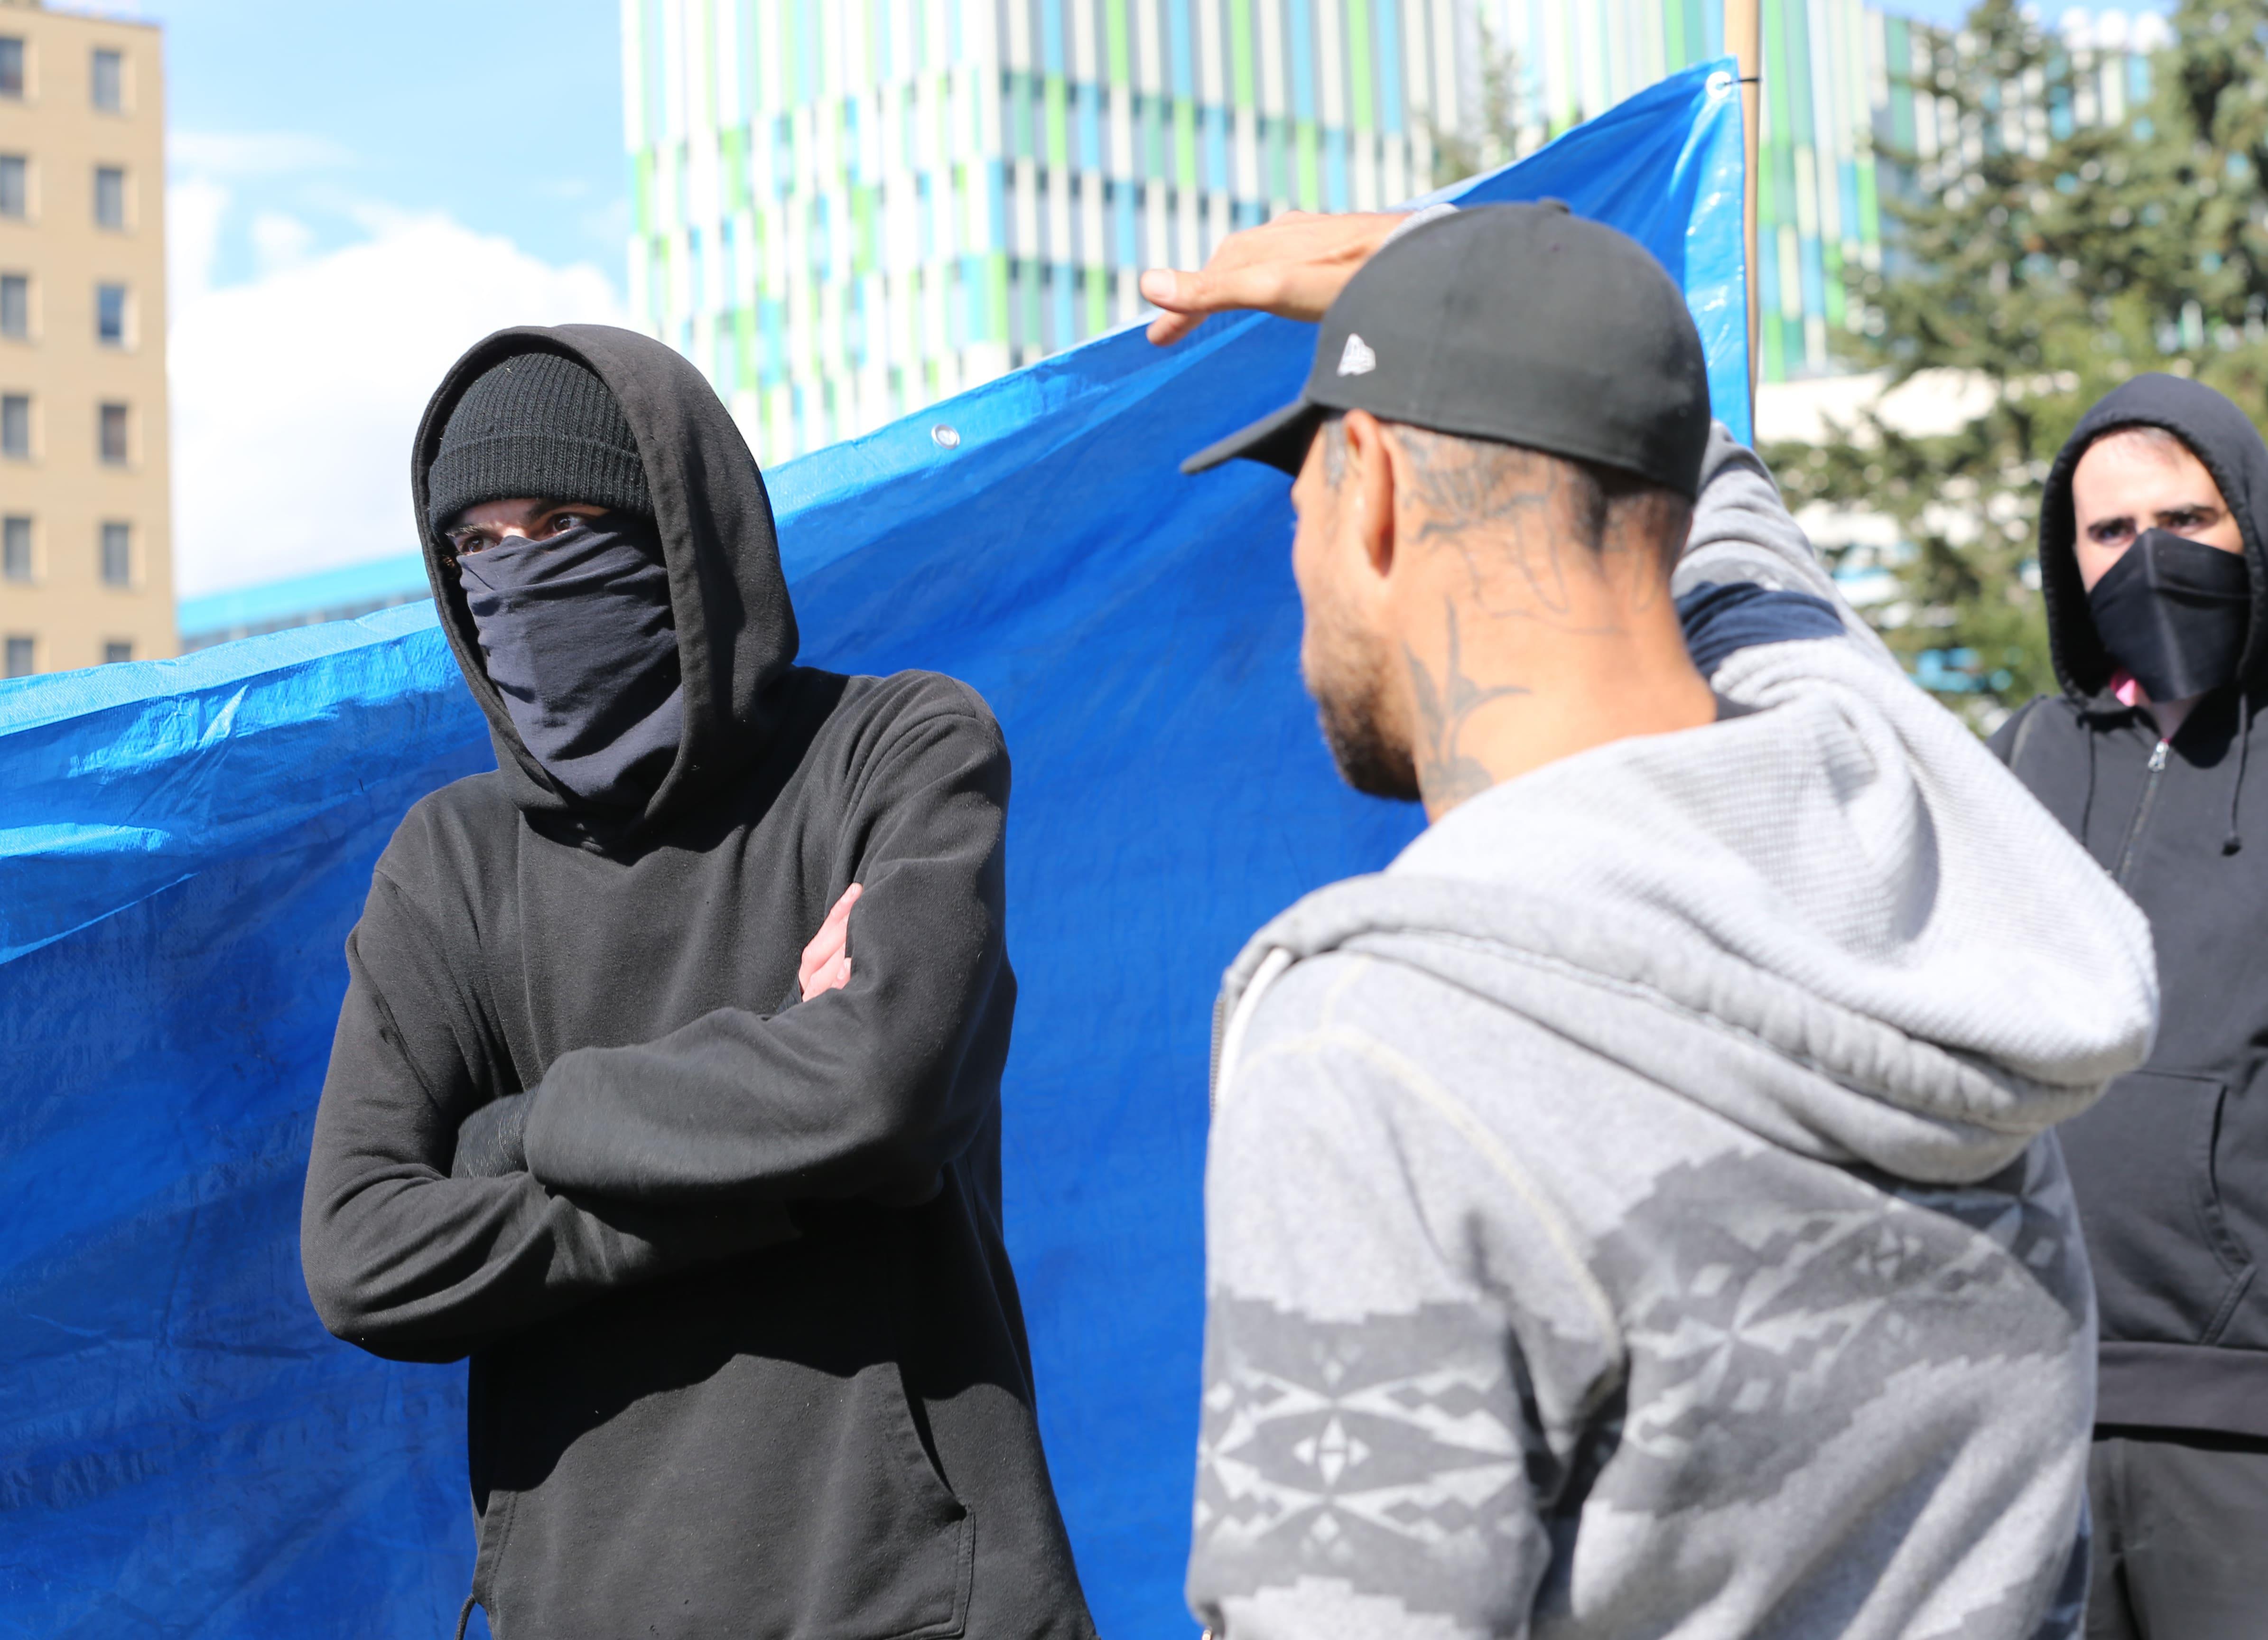 Silent Vigil against COVID-19 measures calgary alberta 13 09 2021 477-min.jpg